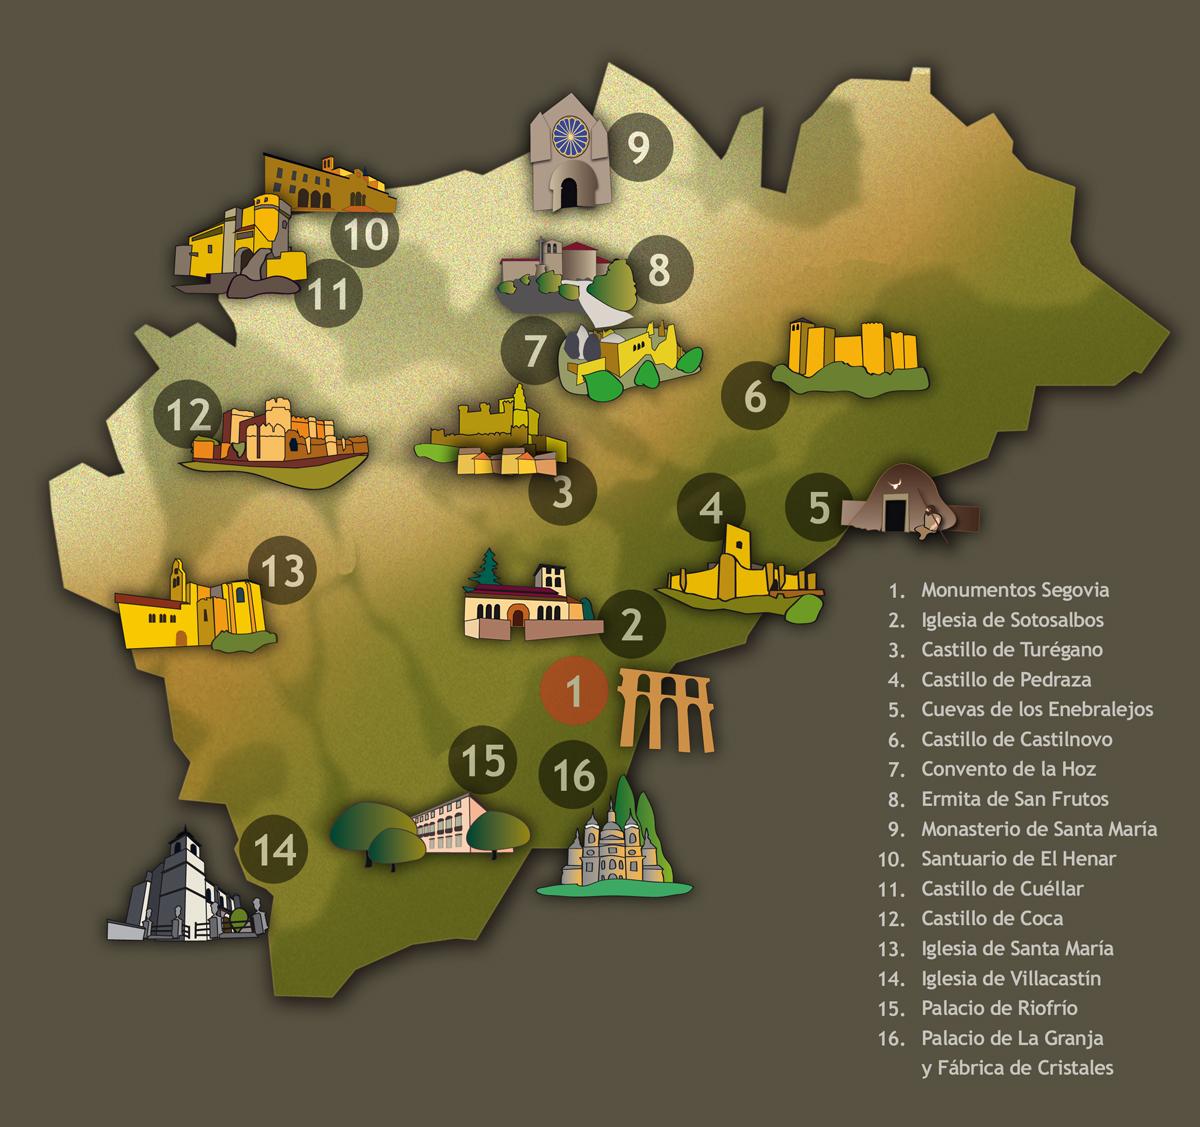 Provincia De Segovia Mapa.Monumentos De Segovia Y Provincia Segovia Un Buen Plan